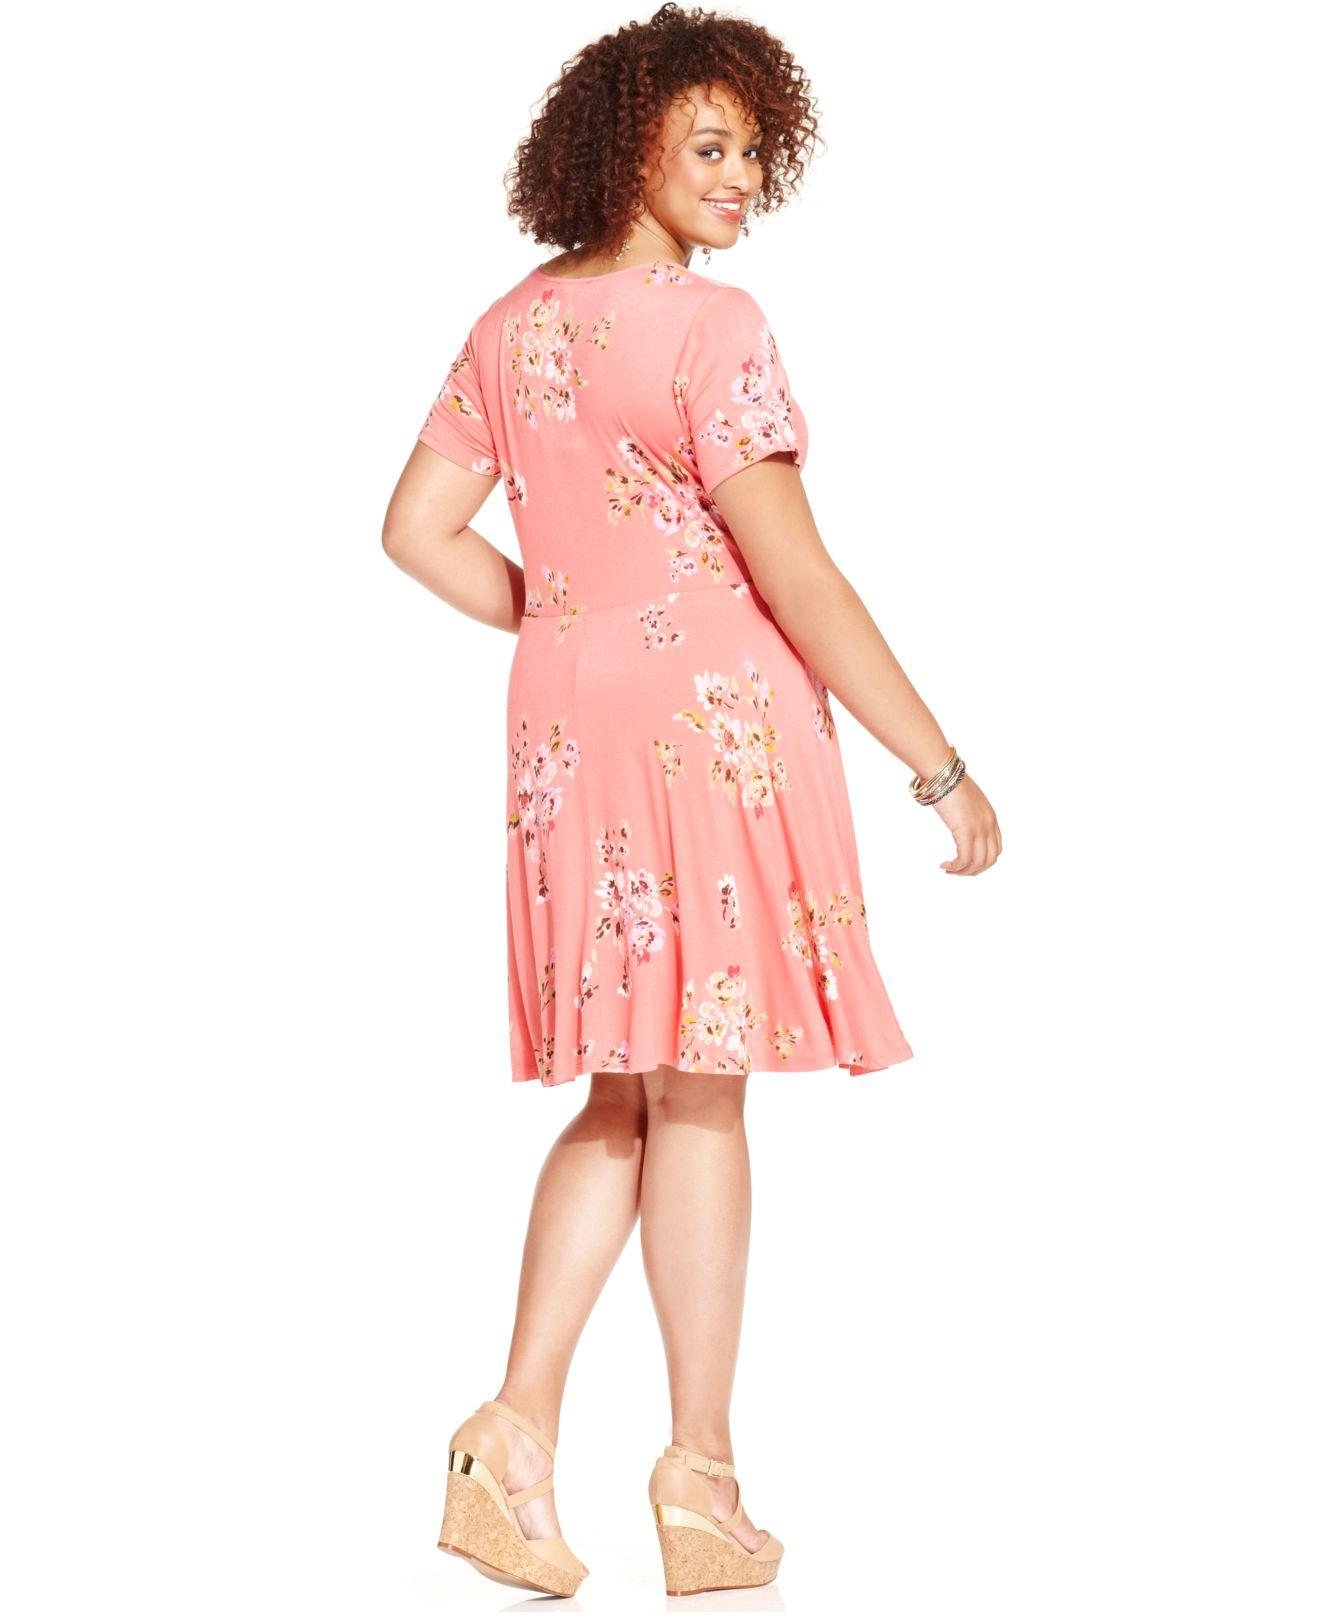 6da74fa2623 Lyst - American Rag Plus Size Short Sleeve Floral Print Skater Dress ...